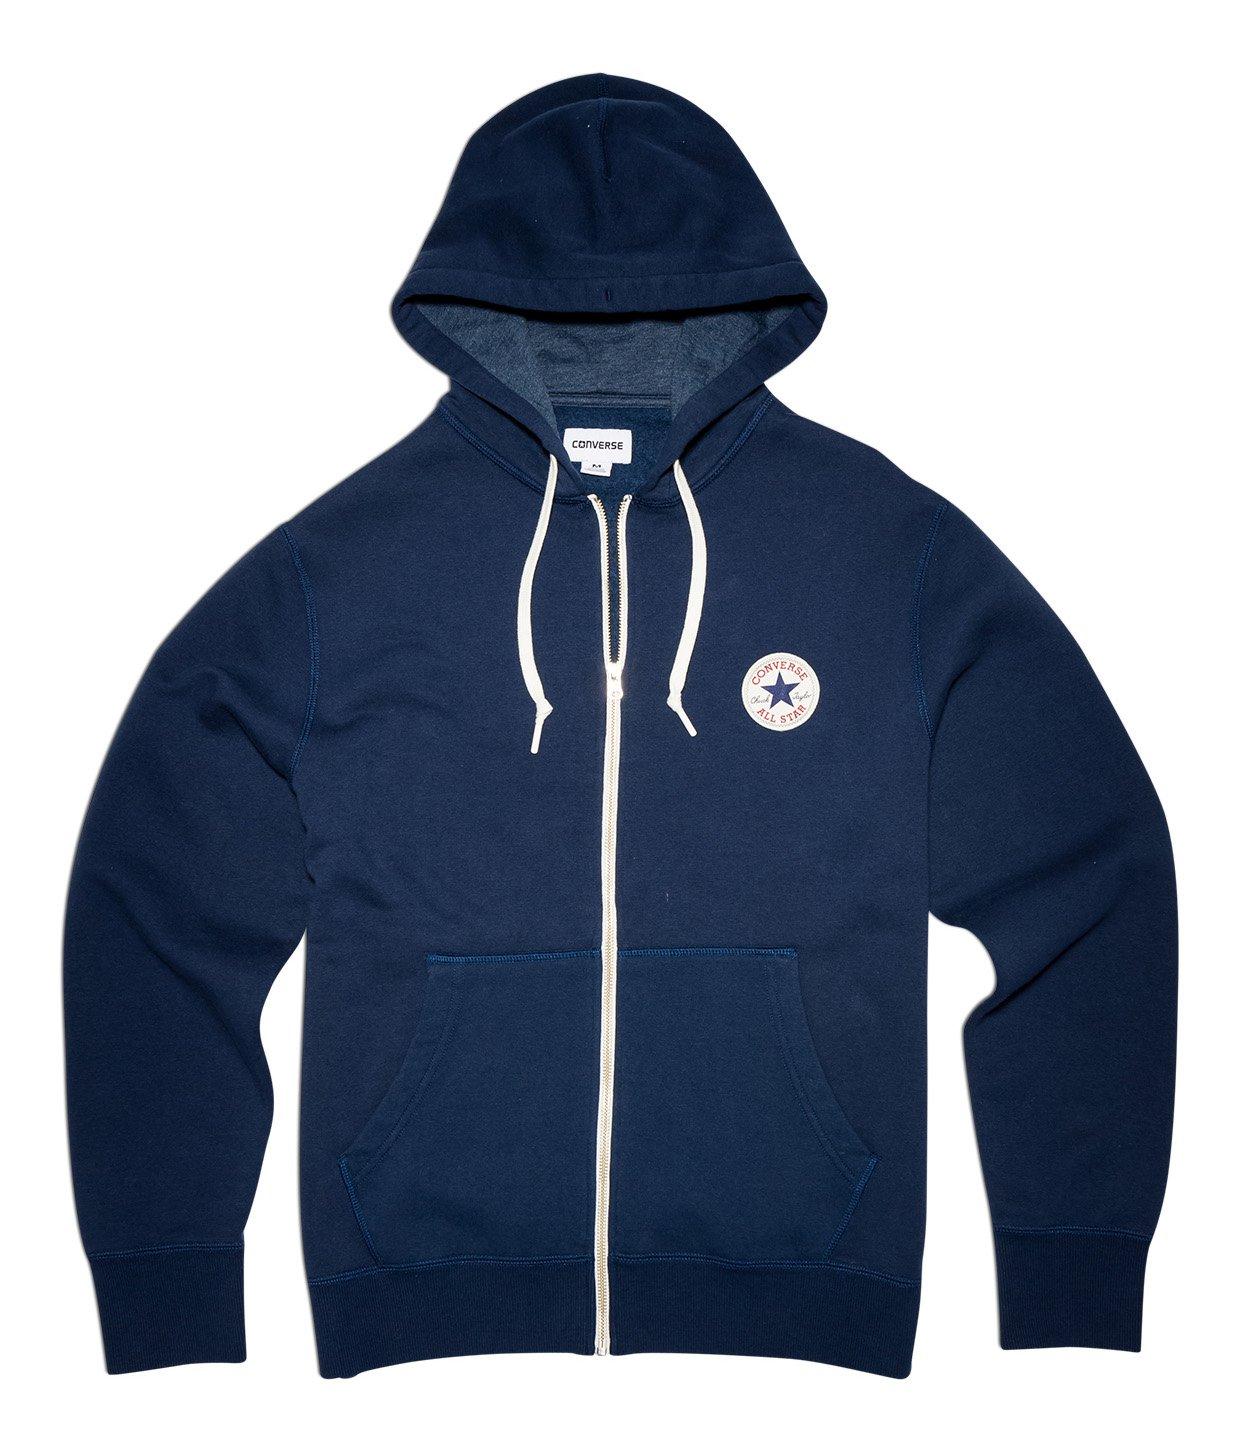 585e9bc14eed80 Converse Core Logo Zip Hoodie Navy Small Navy  Amazon.co.uk  Clothing